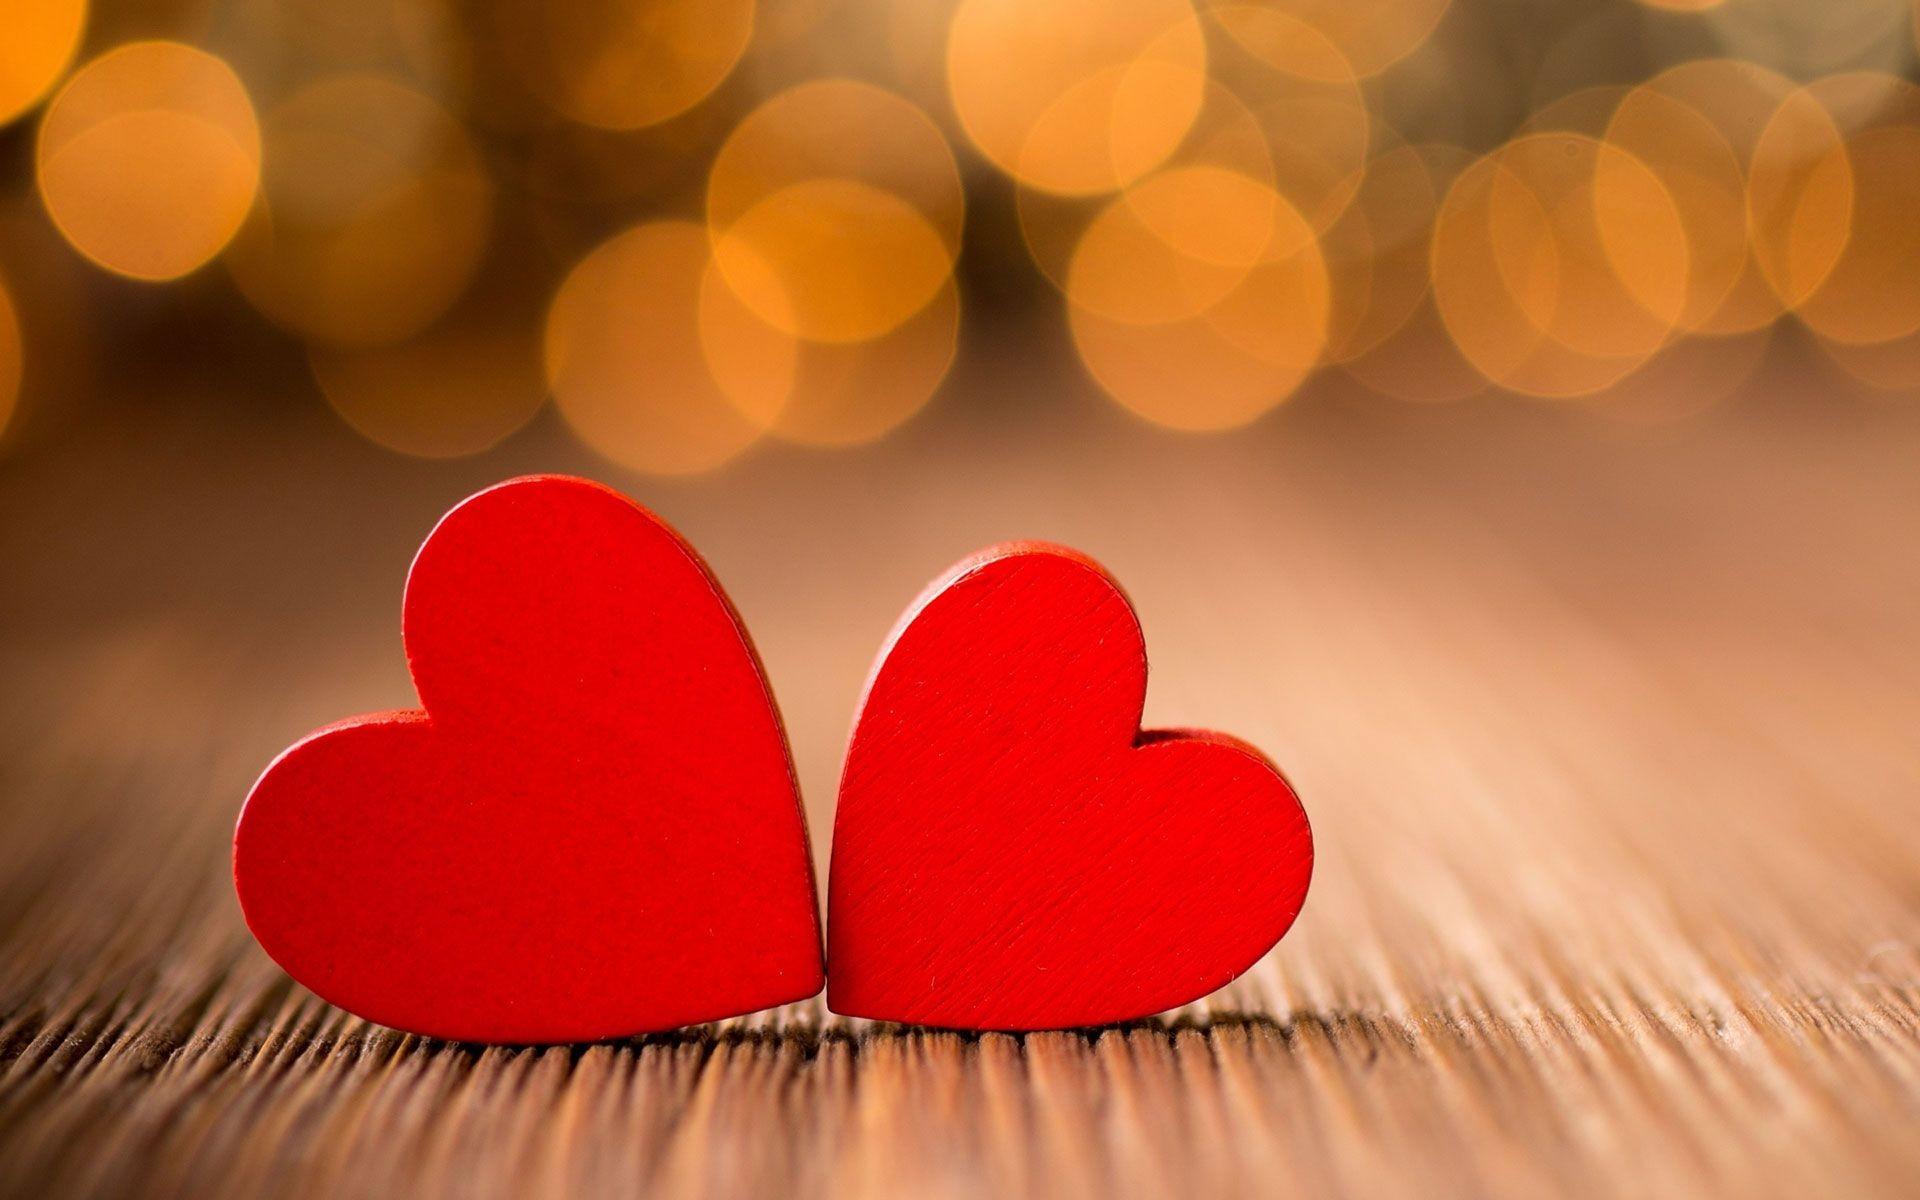 Cute Love Heart wallpaper HD -Free Pink Heart Wallpapers